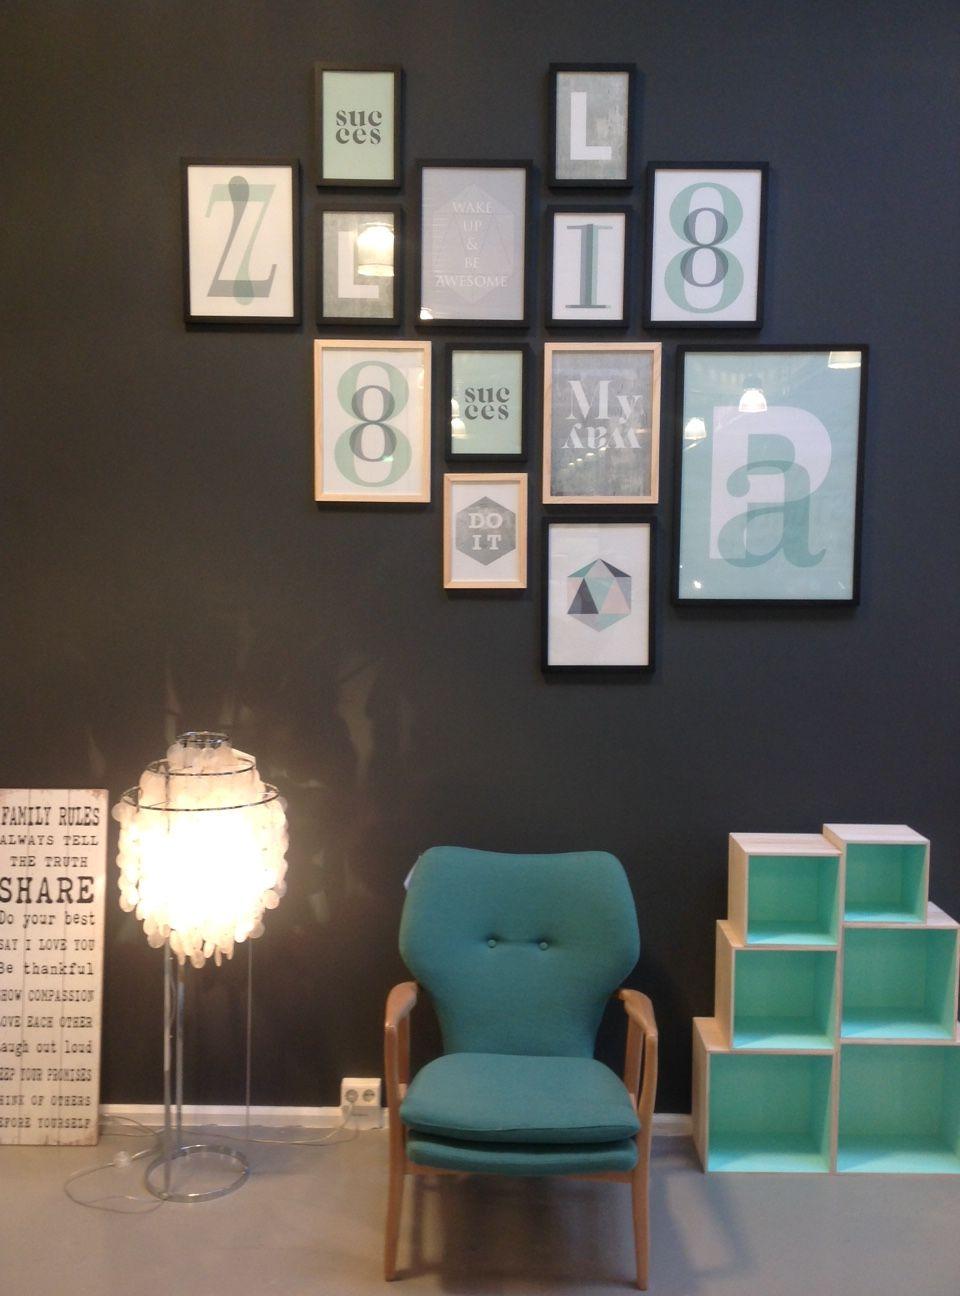 diy wie ordne ich bilderrahmen an die wand dunkelgrau. Black Bedroom Furniture Sets. Home Design Ideas